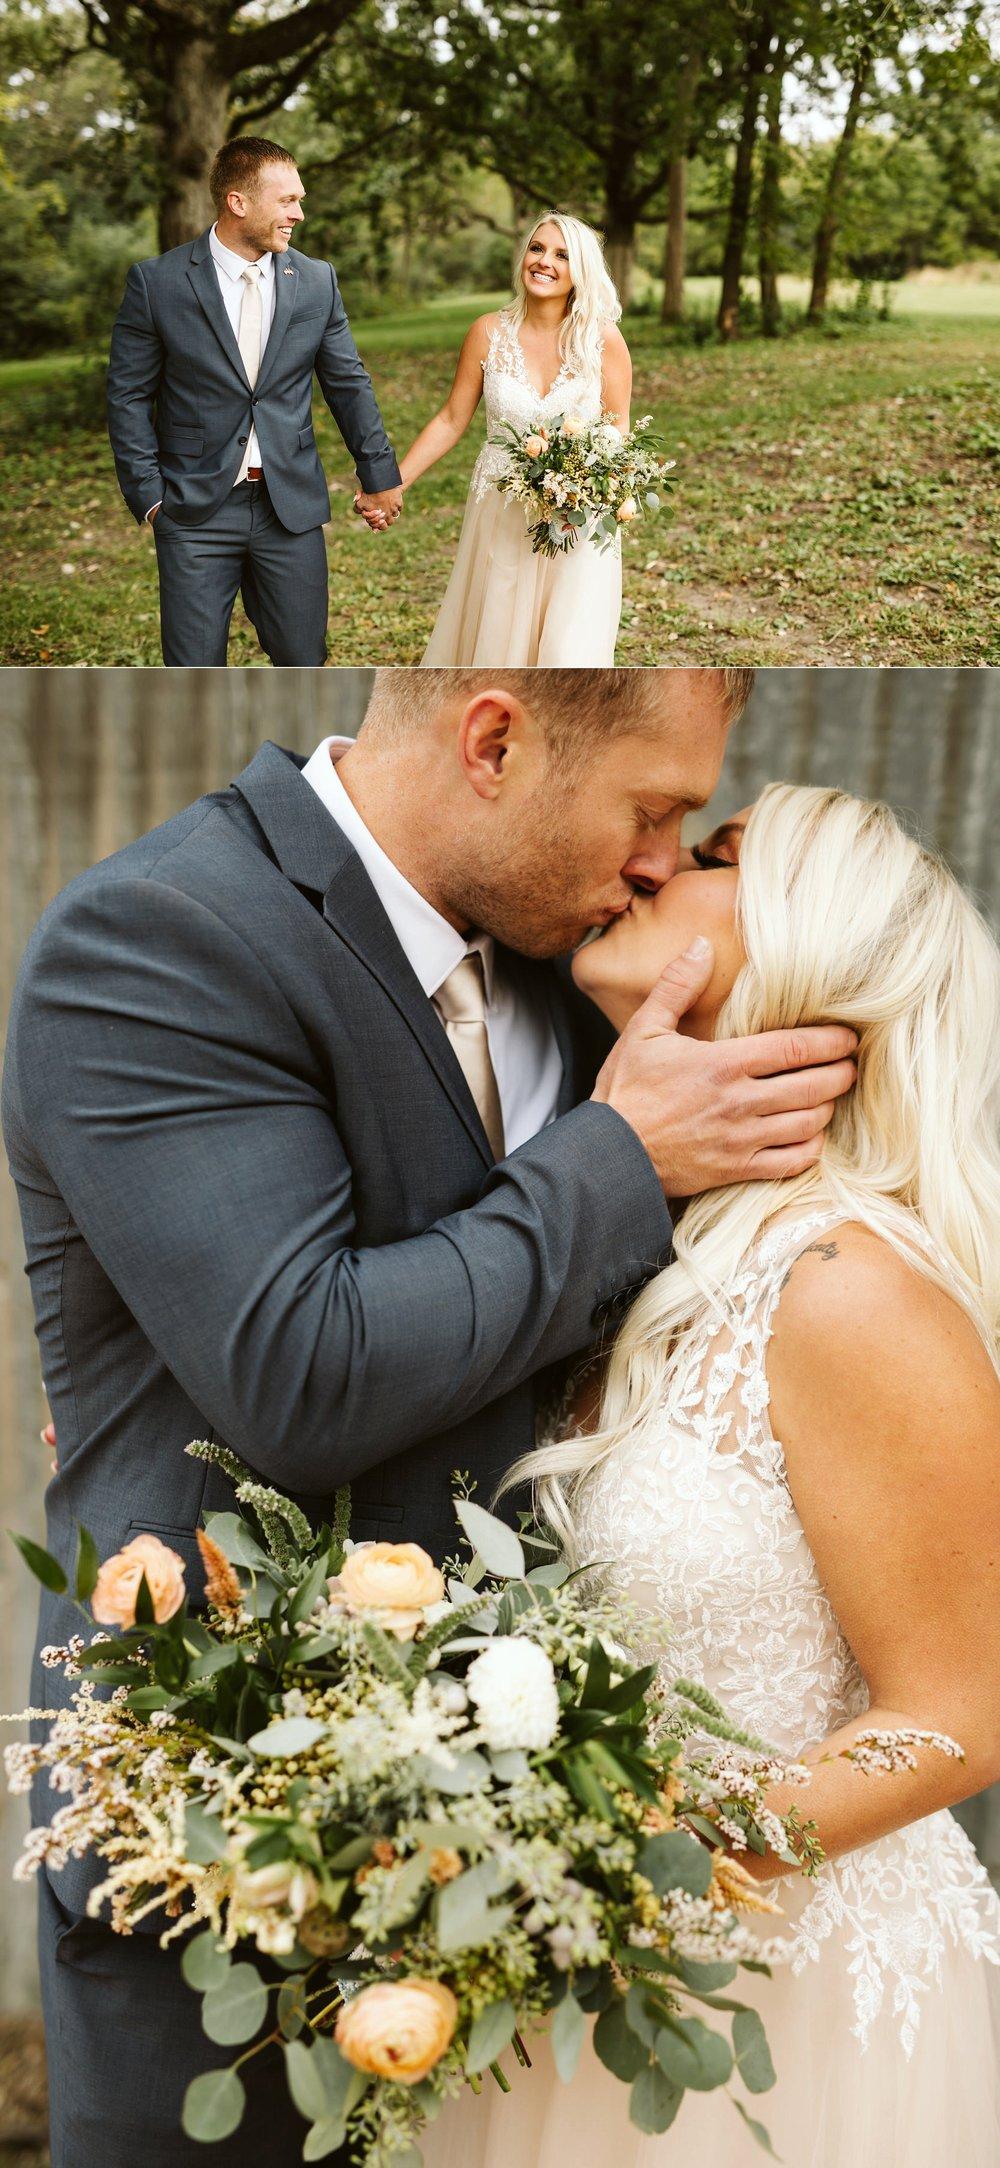 john-p-furber-farm-wedding-in-september-blush-and-floral-85.jpg